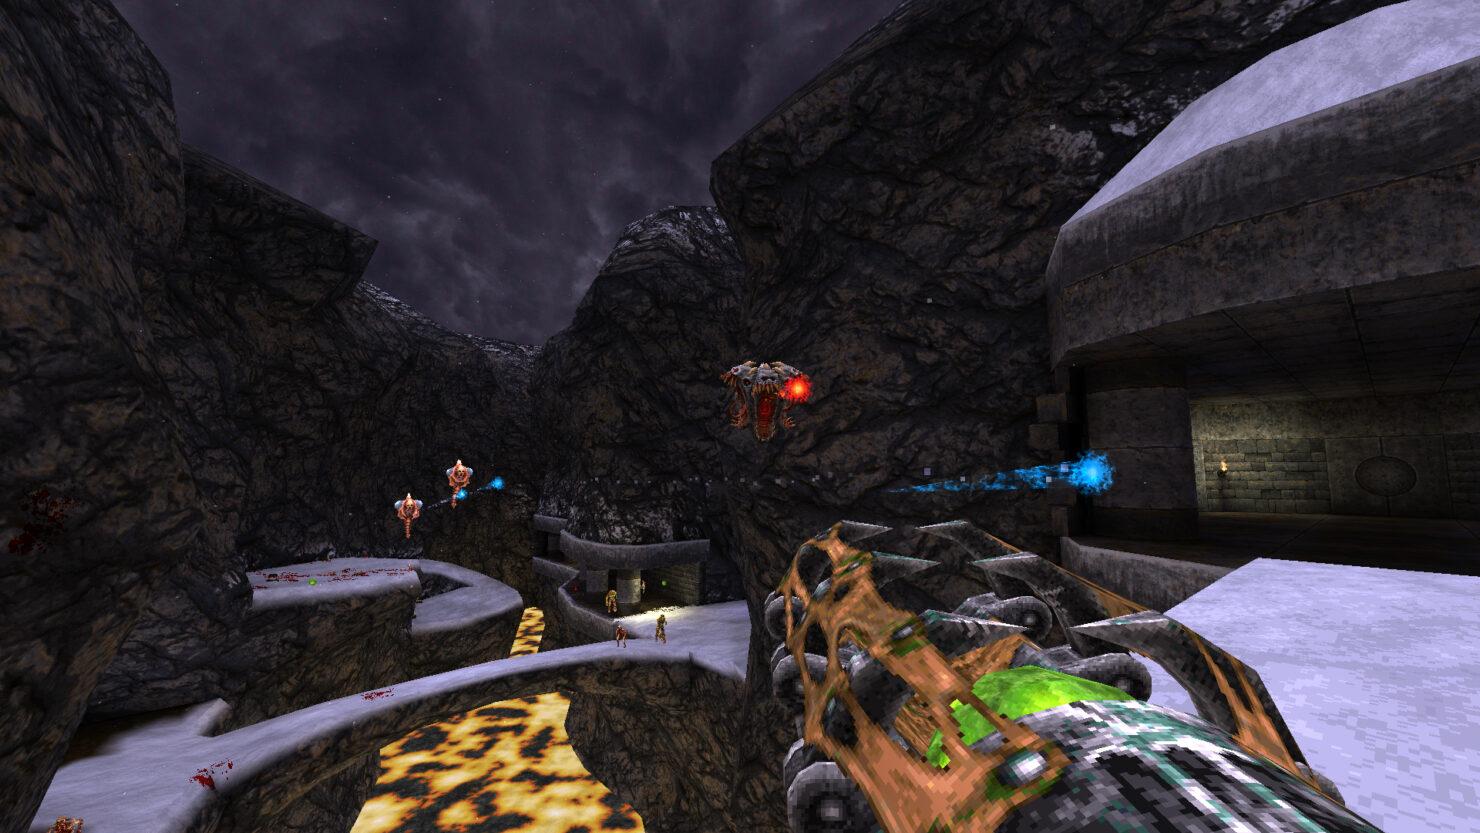 wrath-aeon-of-fury-early-access-launch-02-screenshot-3